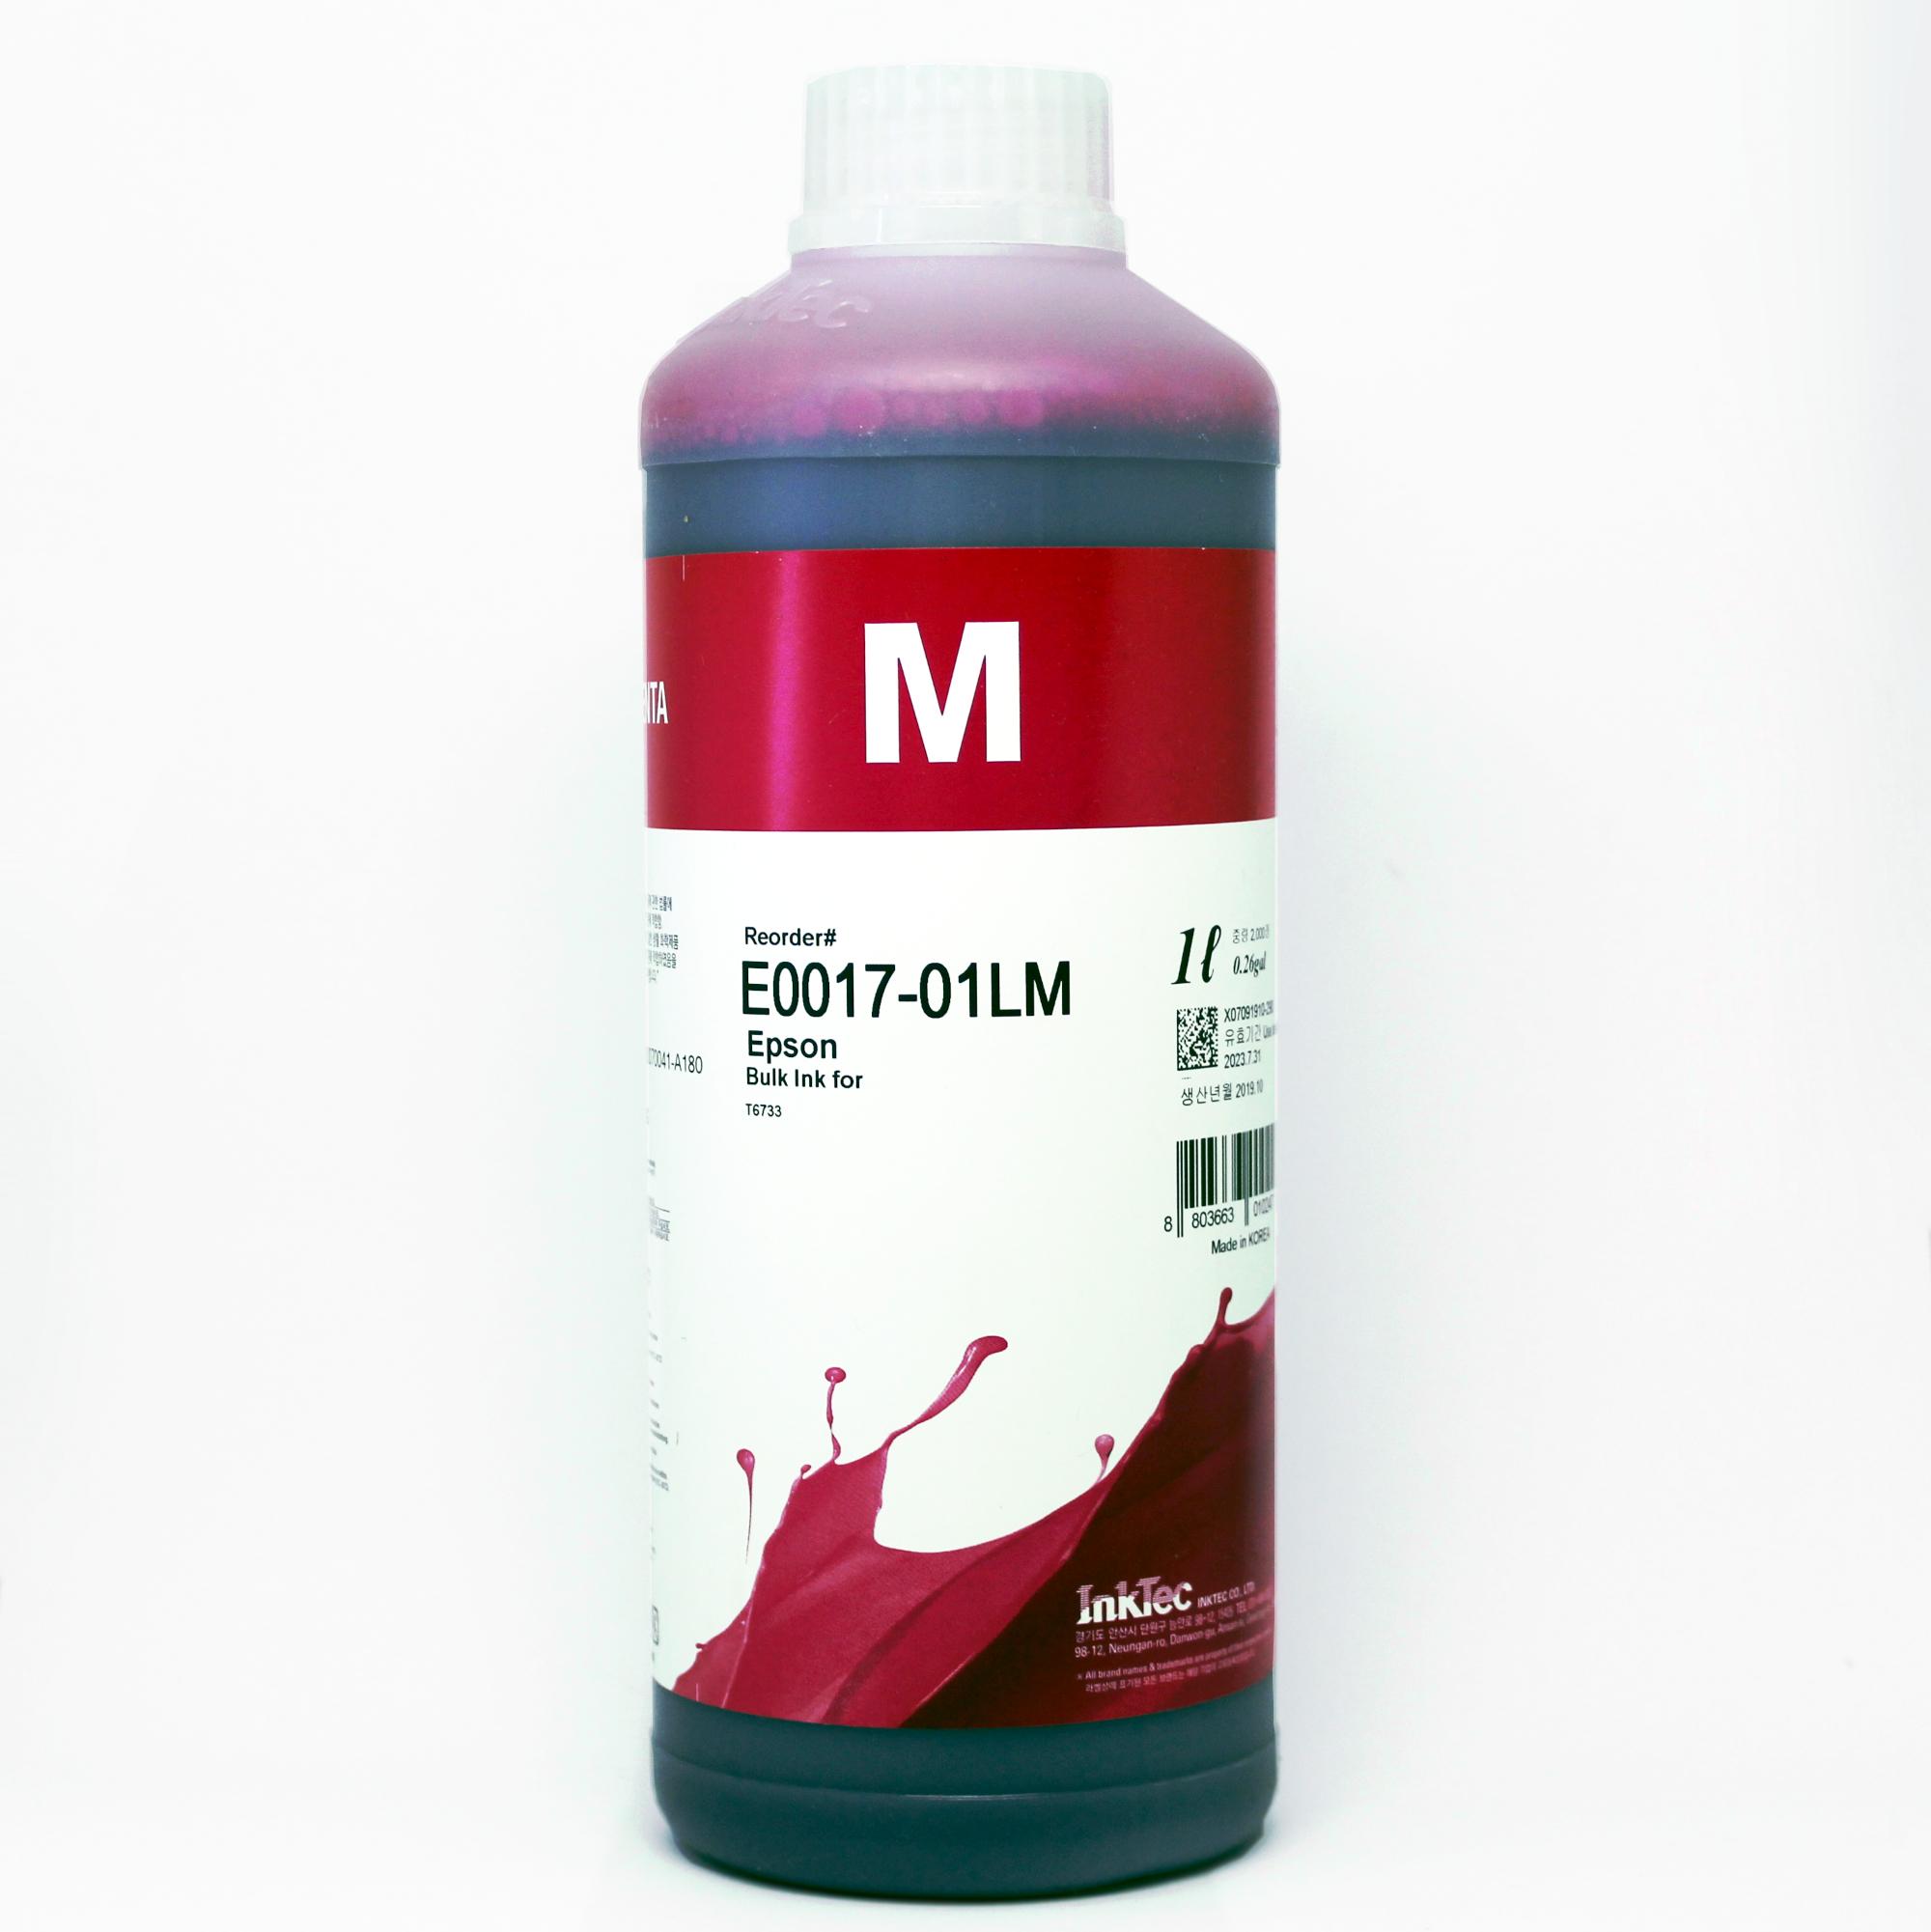 Чернила для L800, L805, L1800, L850, L810 (Epson Фабрика Печати / T6733), водорастворимые InkTec E0017-01LM, пурпурные Magenta, 1 литр по цене 1328 руб.